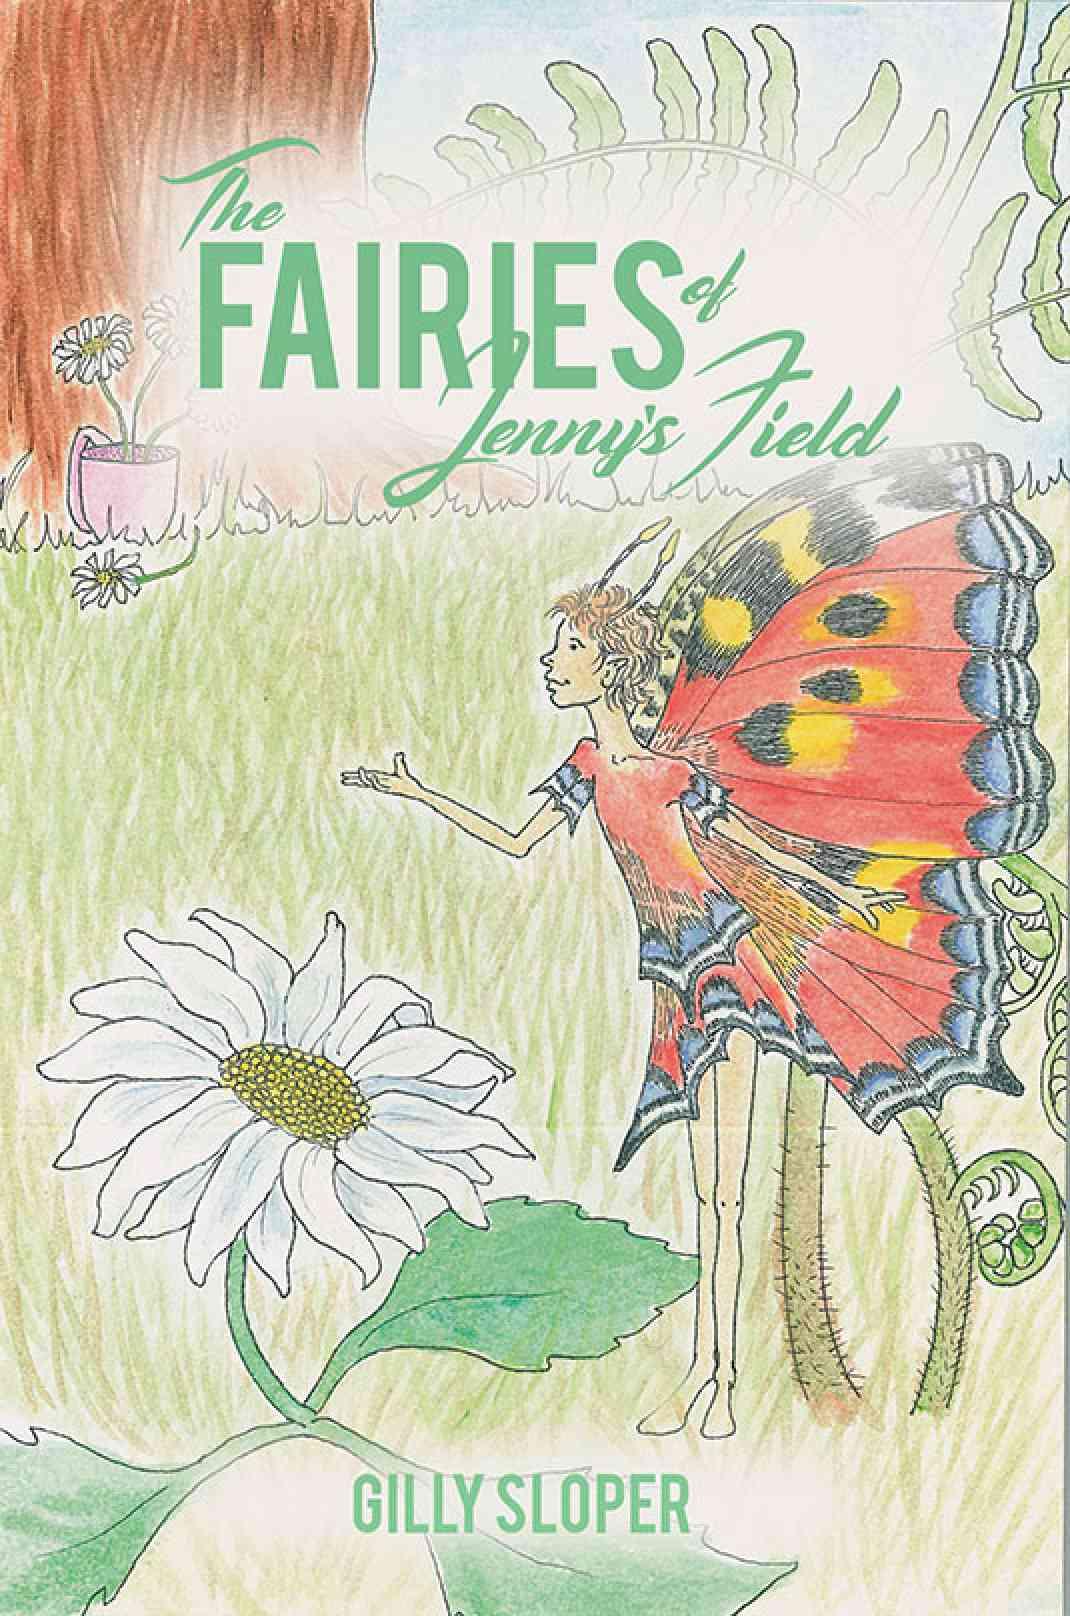 The Fairies of Jenny's Field